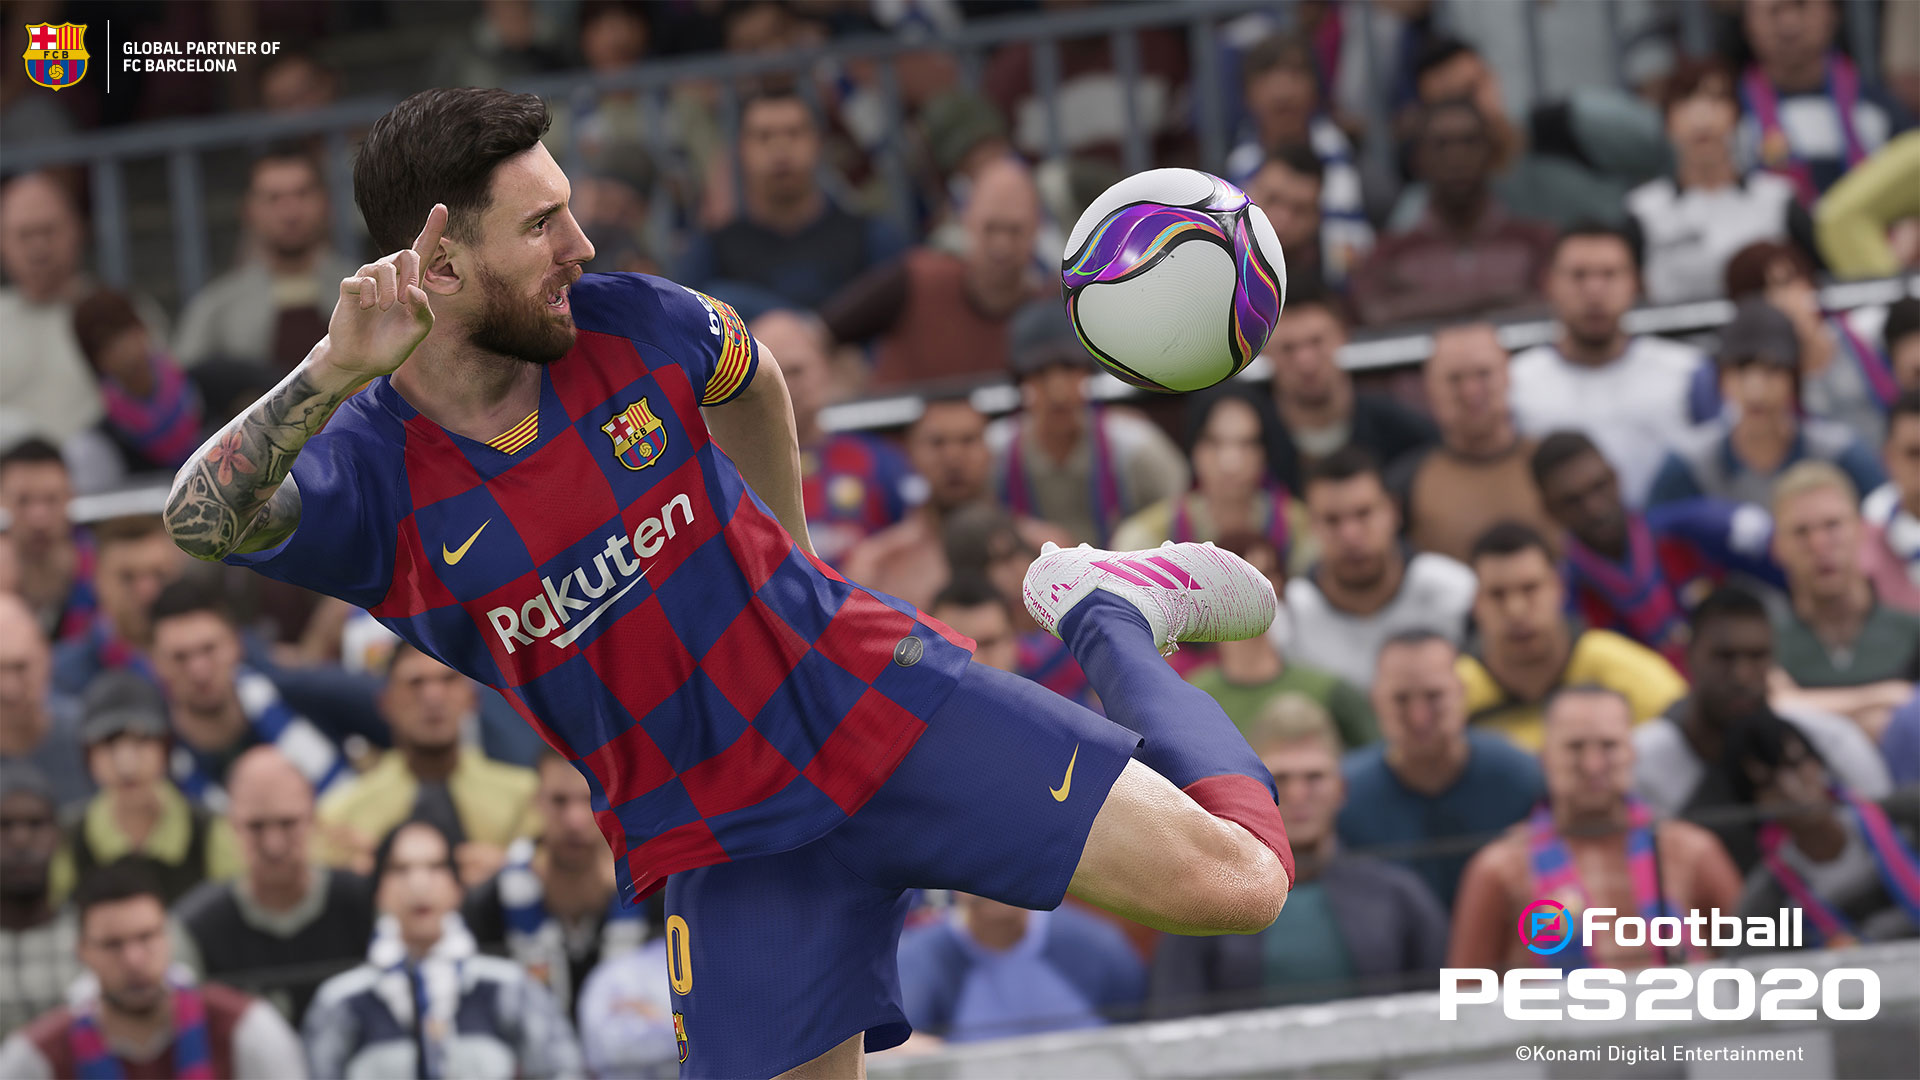 PES 2020 ball control